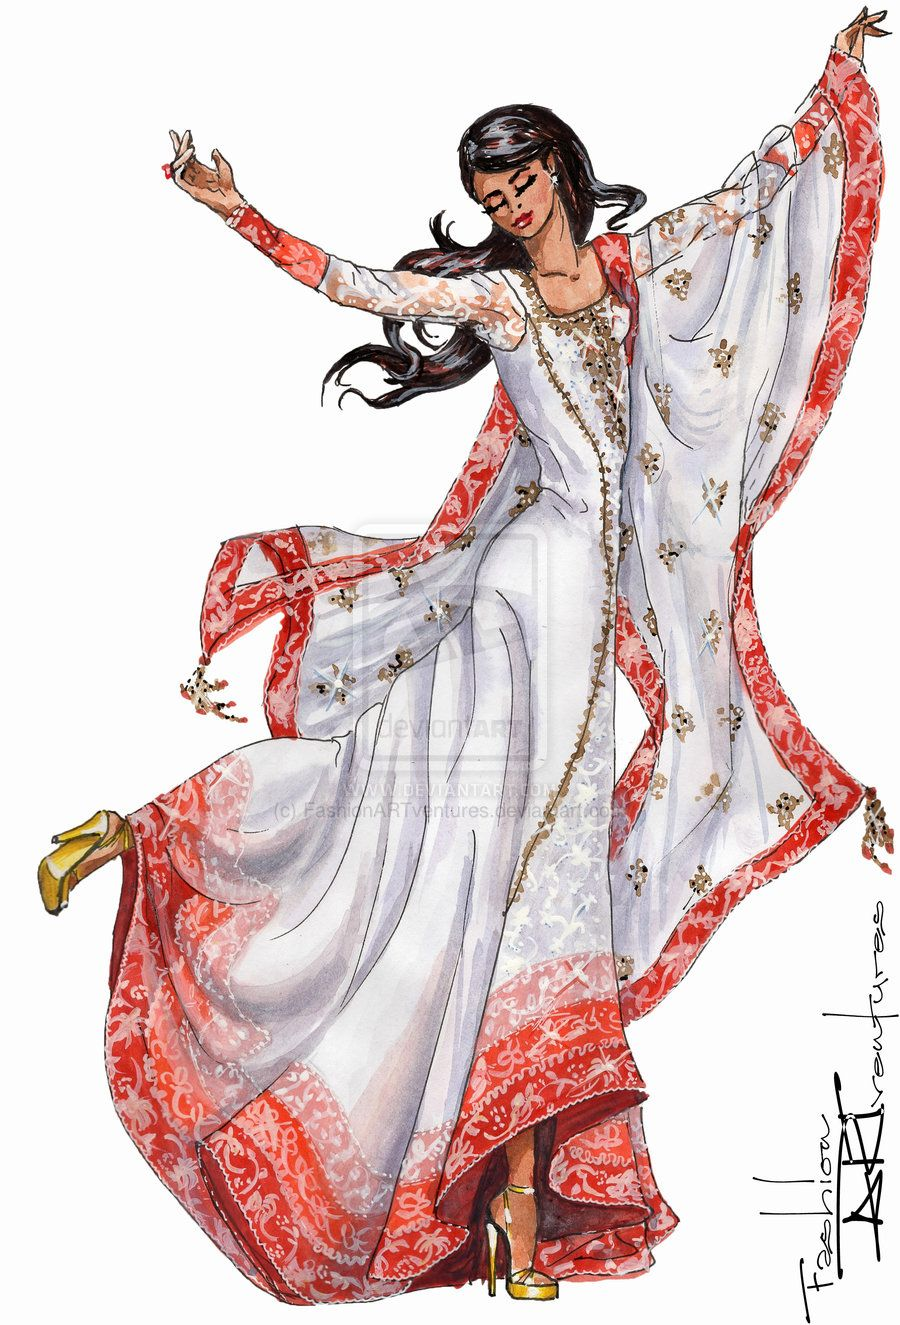 Fashion Costume Design Priyanka Chopra S Anarkali Suit By Manish Malhotra By Fas Fashion Illustration Poses Fashion Illustration Fashion Illustration Dresses